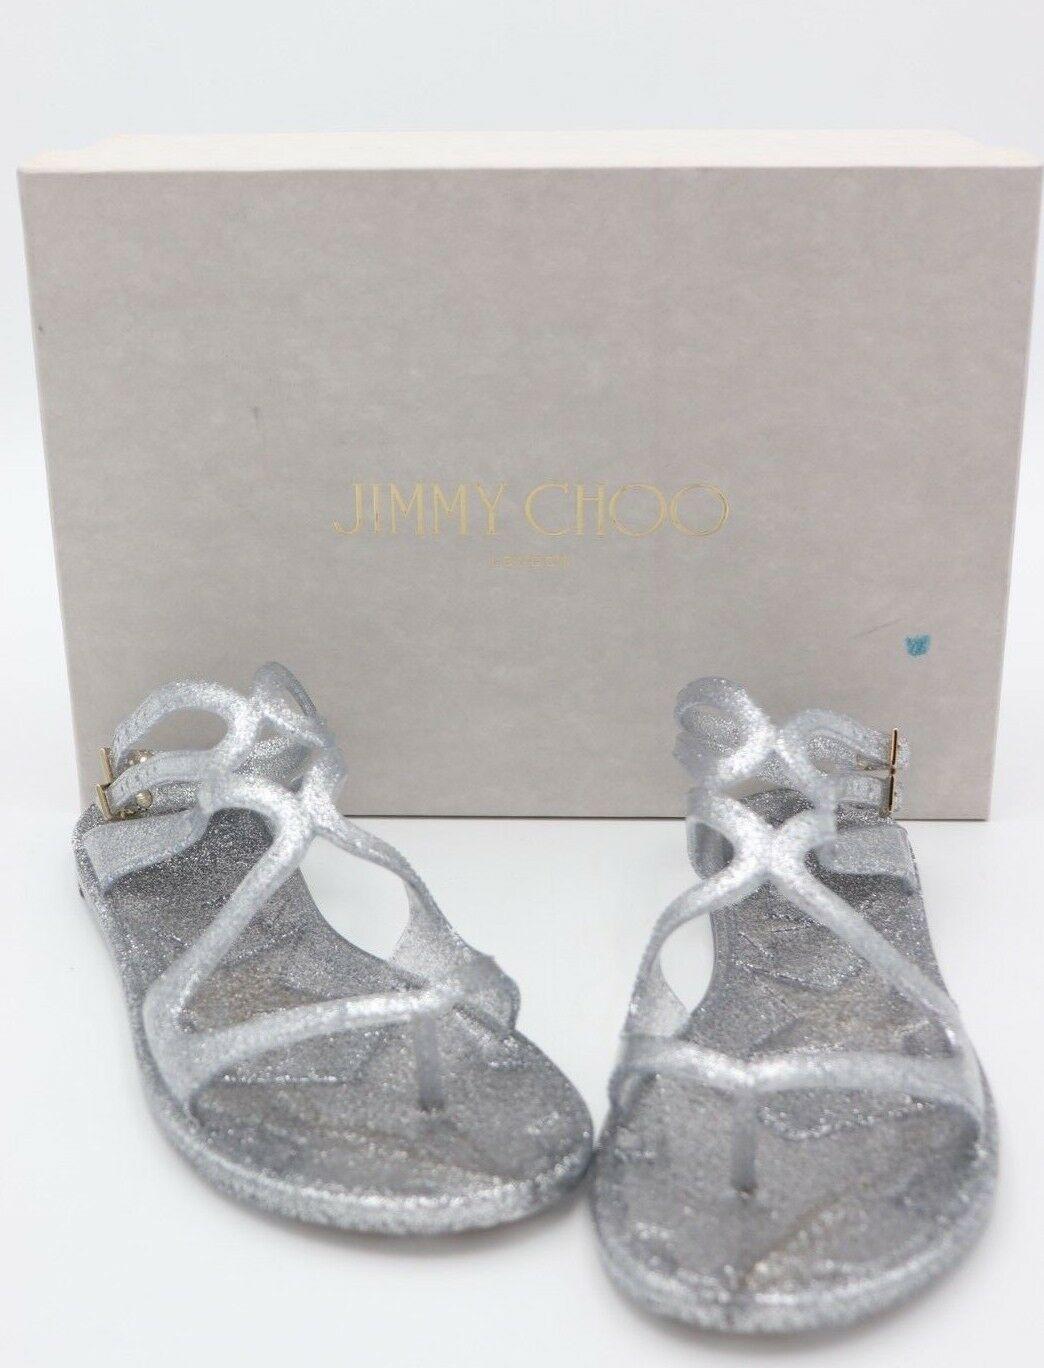 NIB Jimmy Choo Lance Silver Metallic Glitter Rubber Jelly Sandals 7 37 New